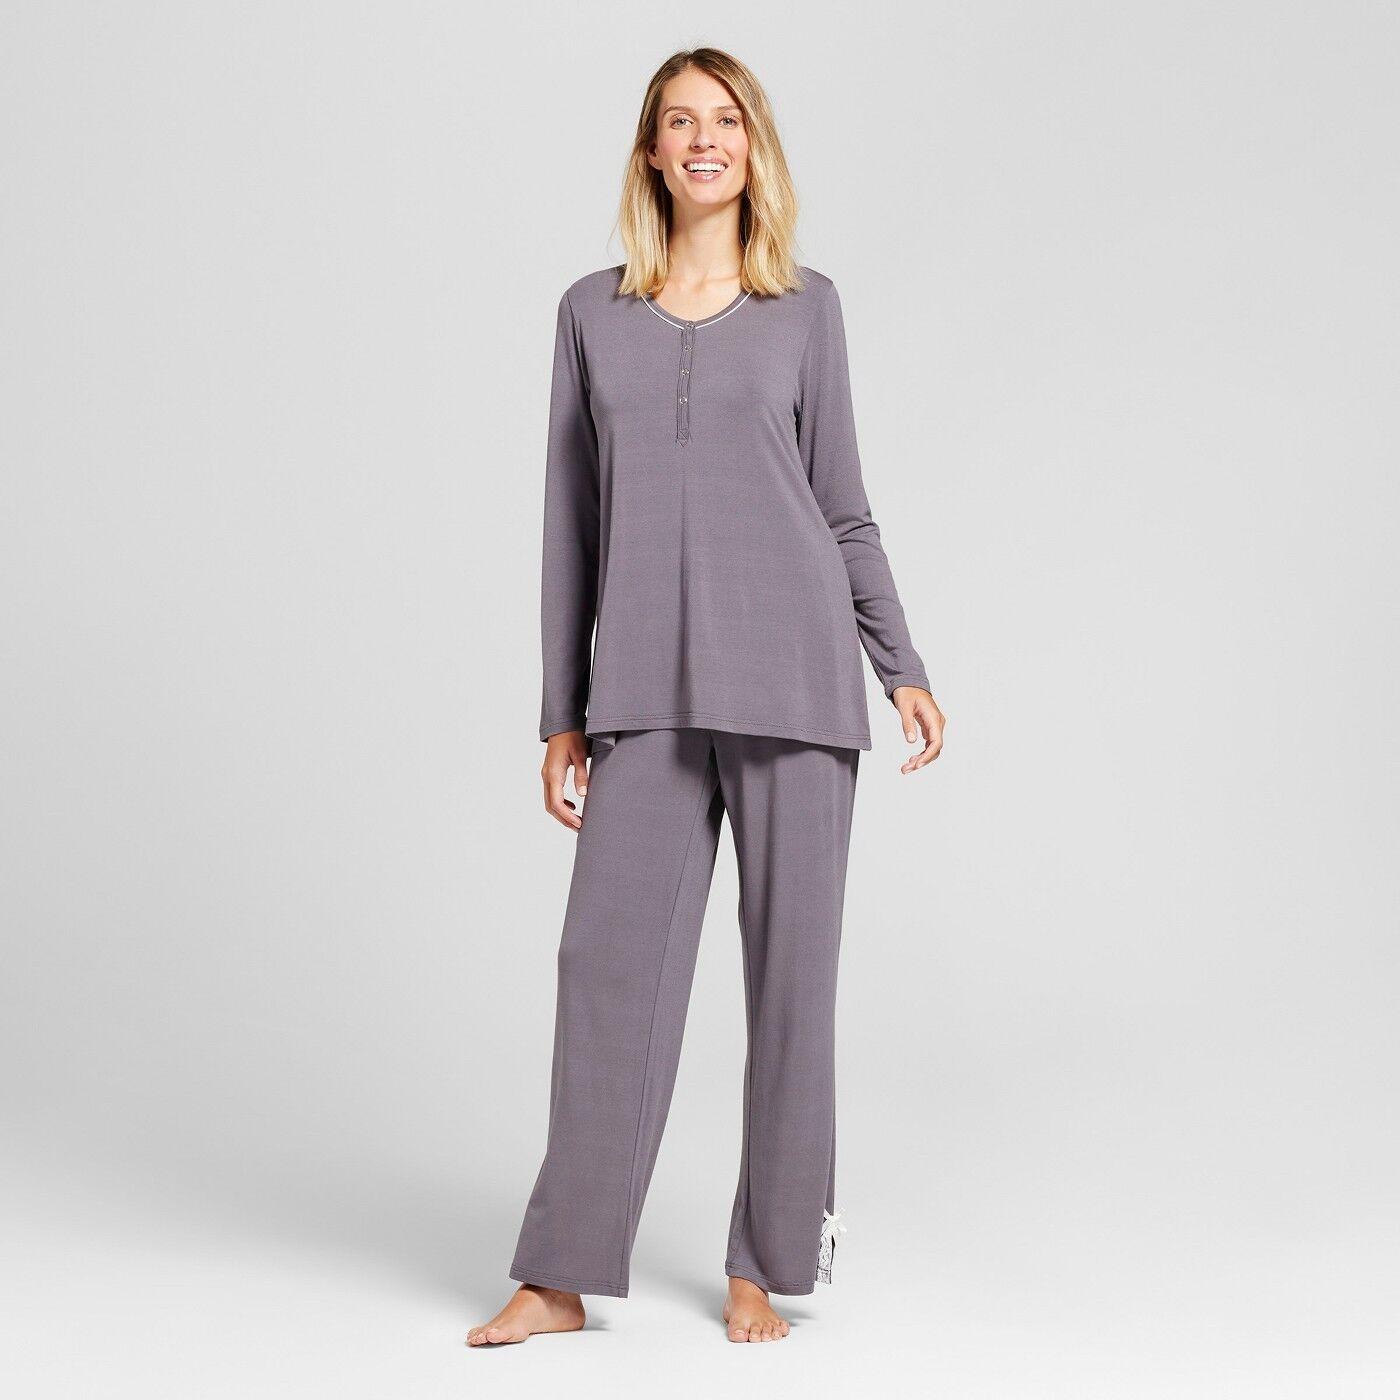 Lamaze Women Nursing Long Sleeve Henley Top & Pants Pajama Set Graphite, Small Clothing, Shoes & Accessories